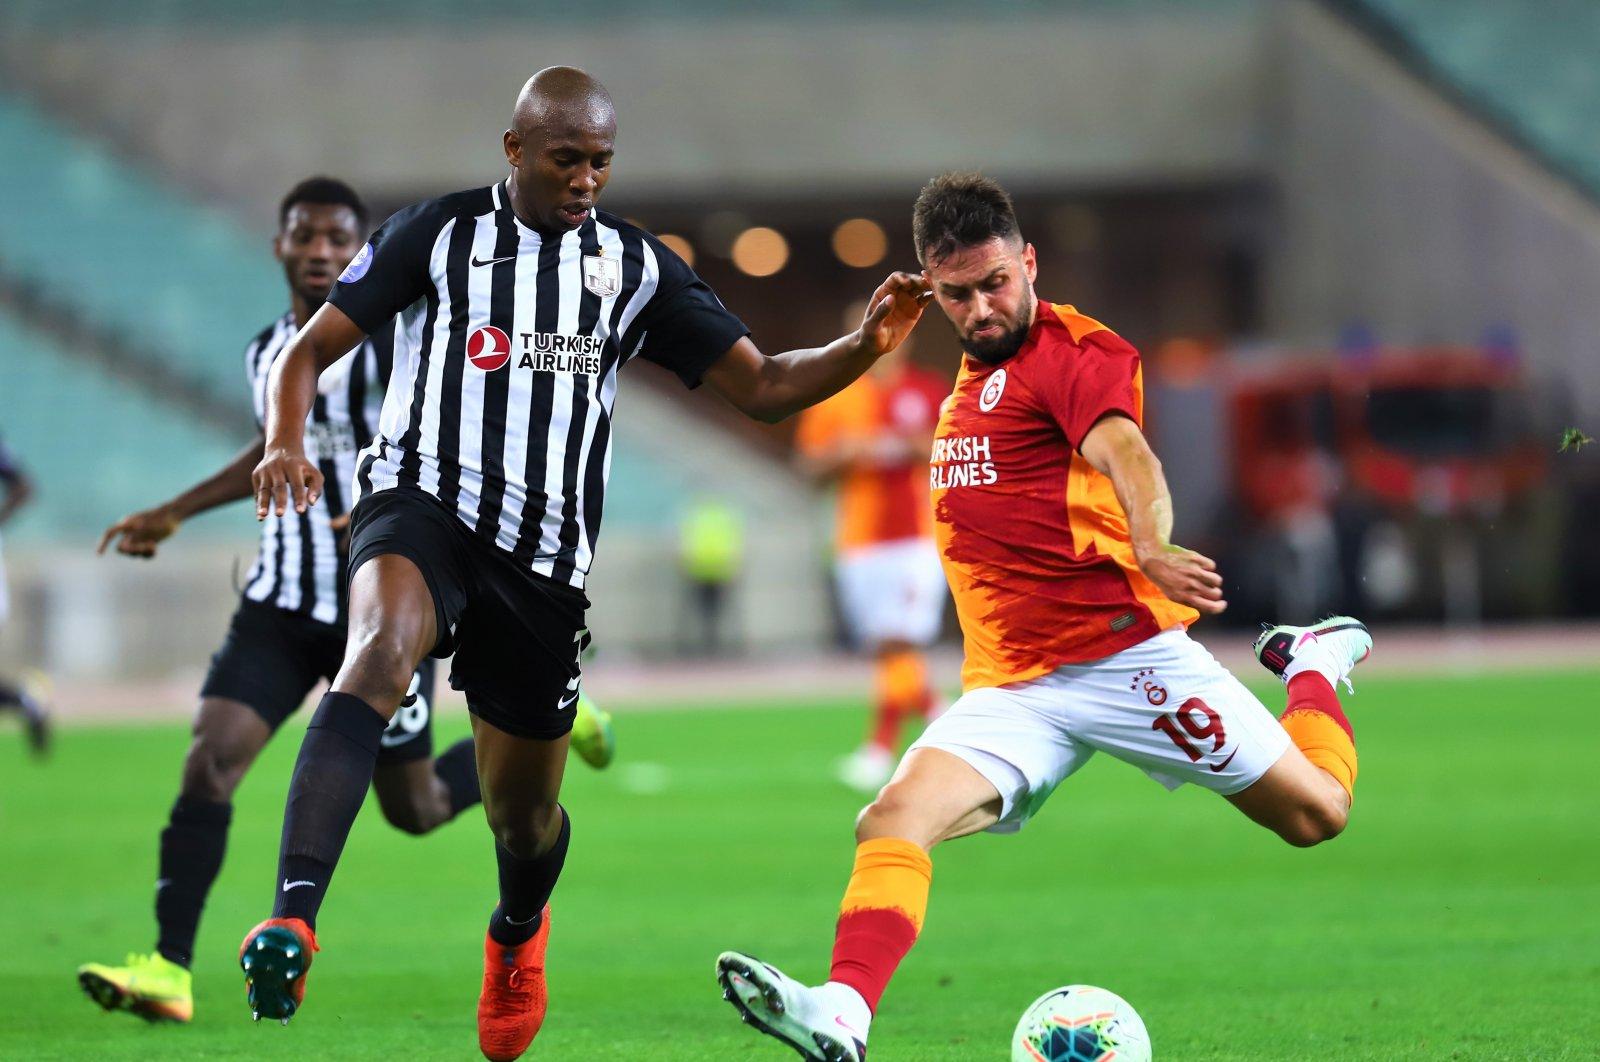 Galatasaray's Ömer Bayram takes a shot during a Europa League match against Neftçi, in Baku, Azerbaijan, Sept. 17, 2020. (AA Photo)